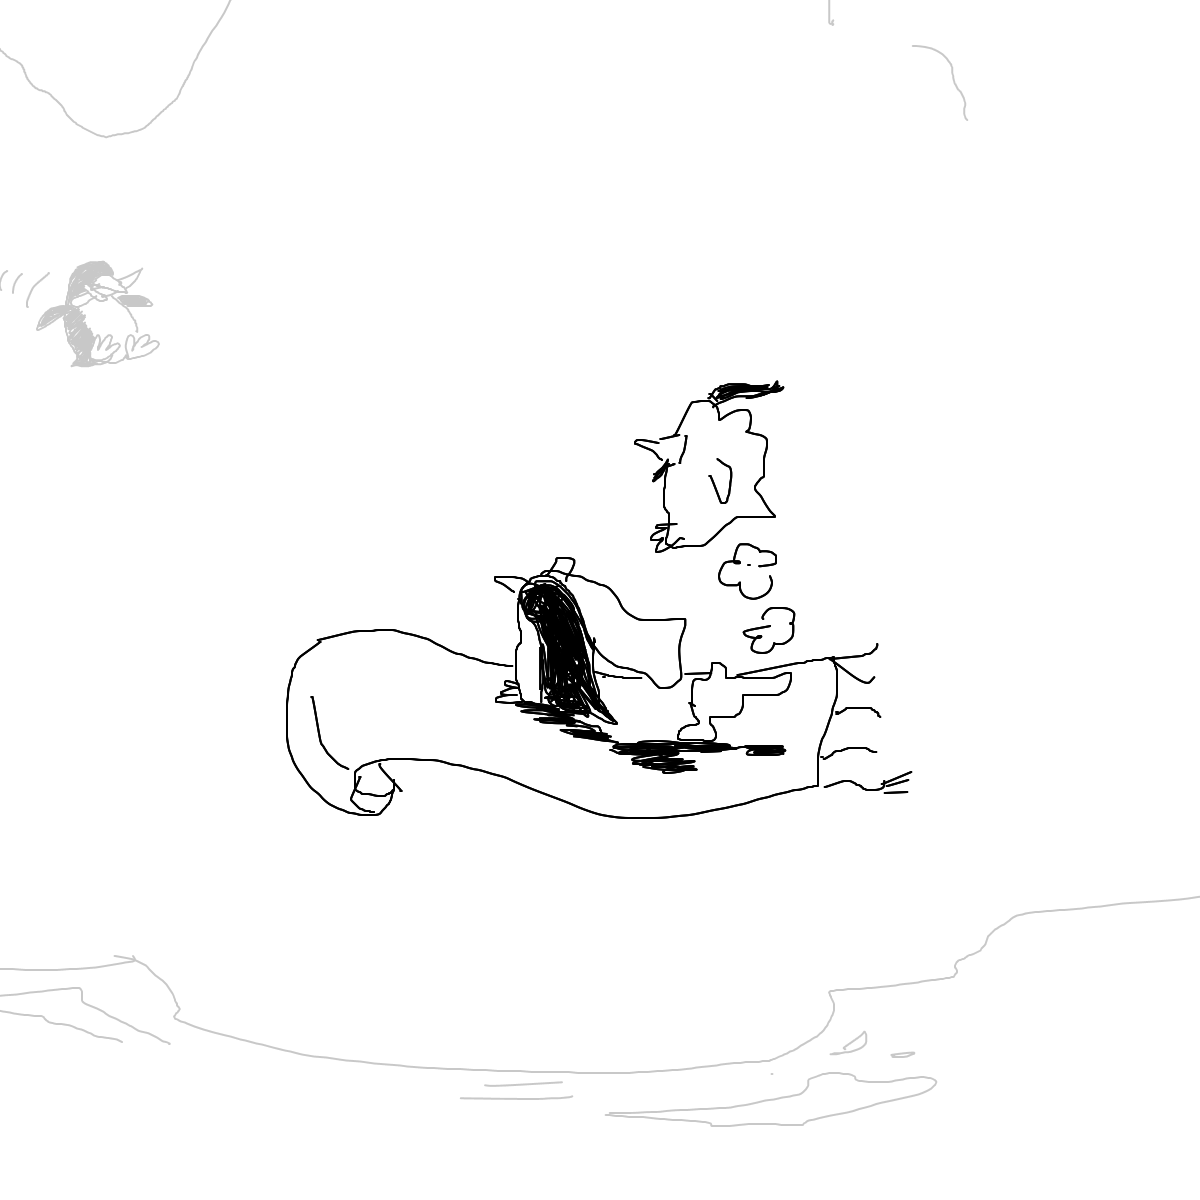 BAAAM drawing#3668 lat:78.4206008911132800lng: -4.4862594604492190